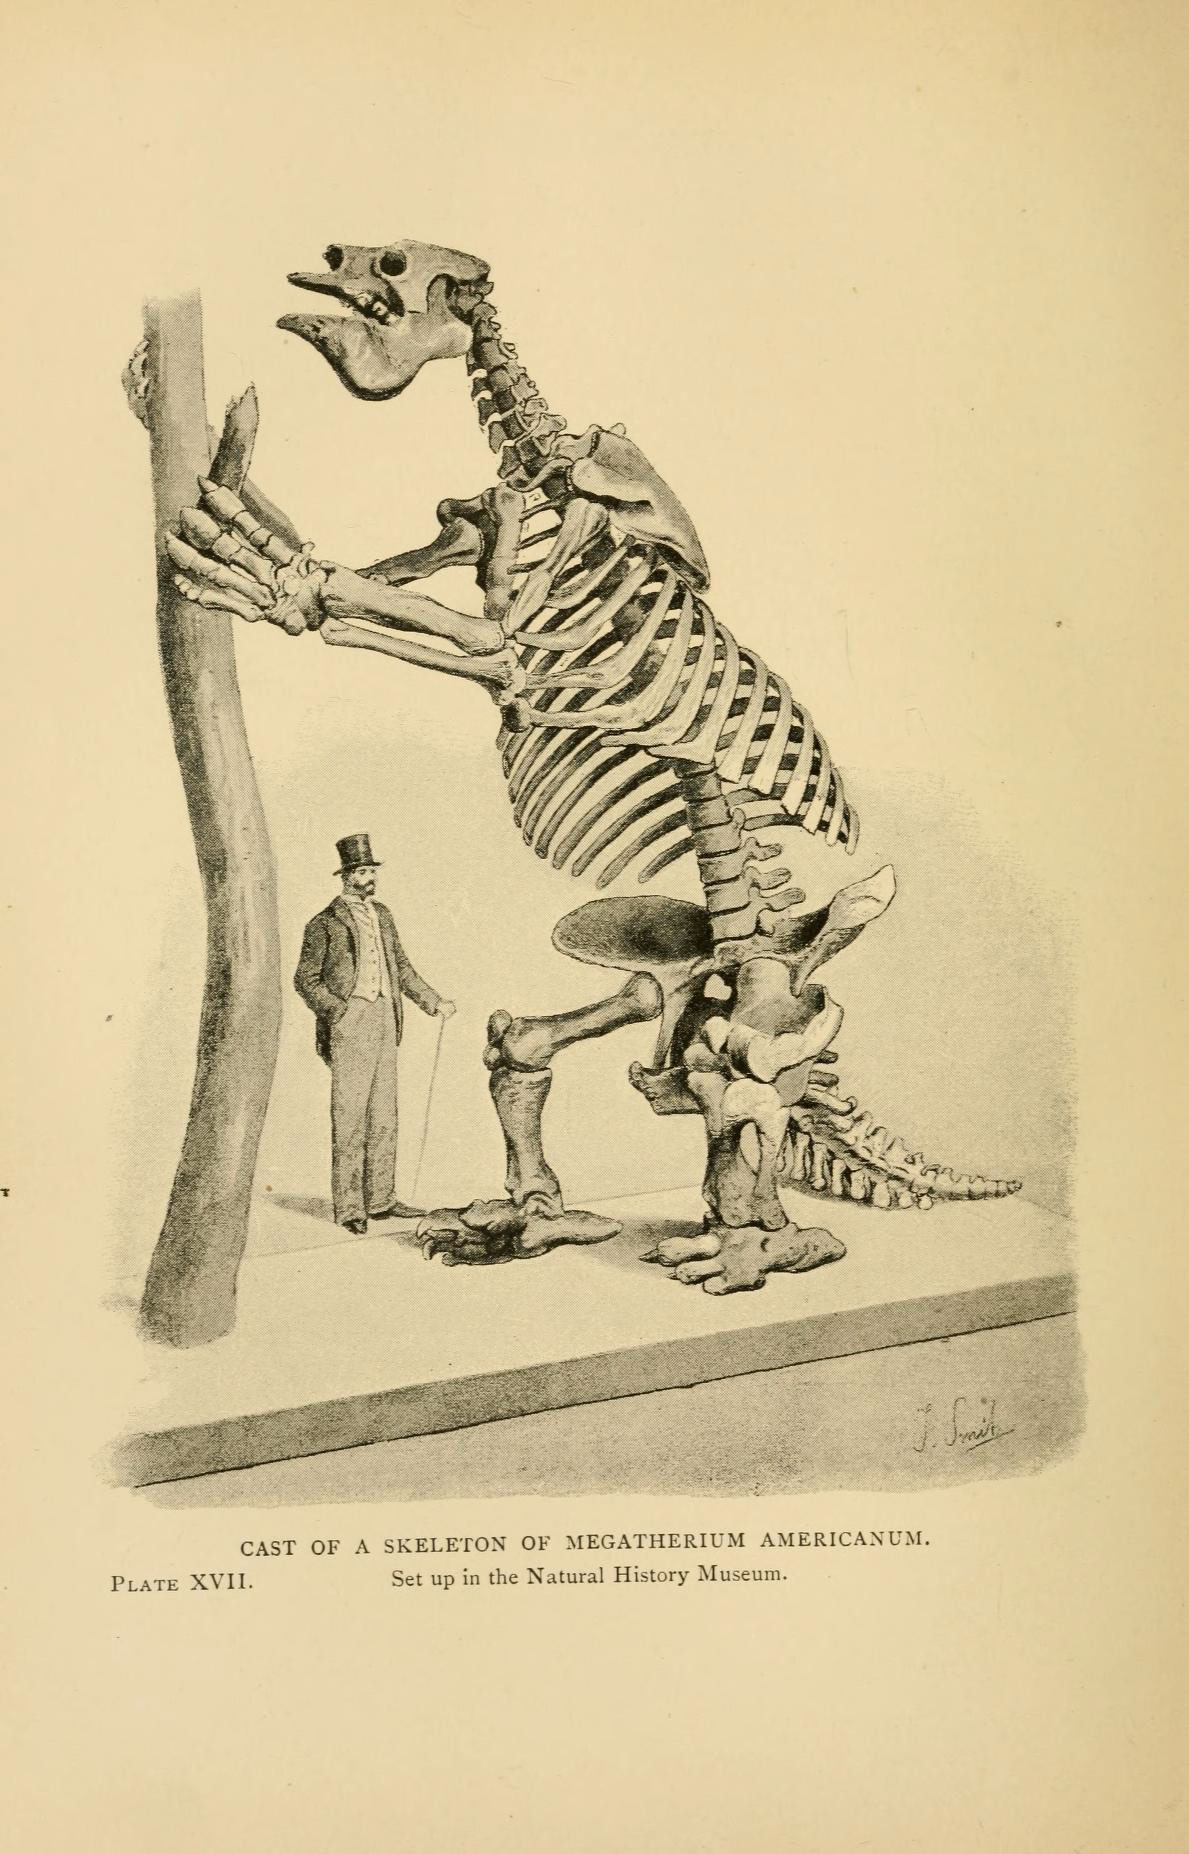 1189x1854 Giant Sloth Megatherium Was A Vegetarian